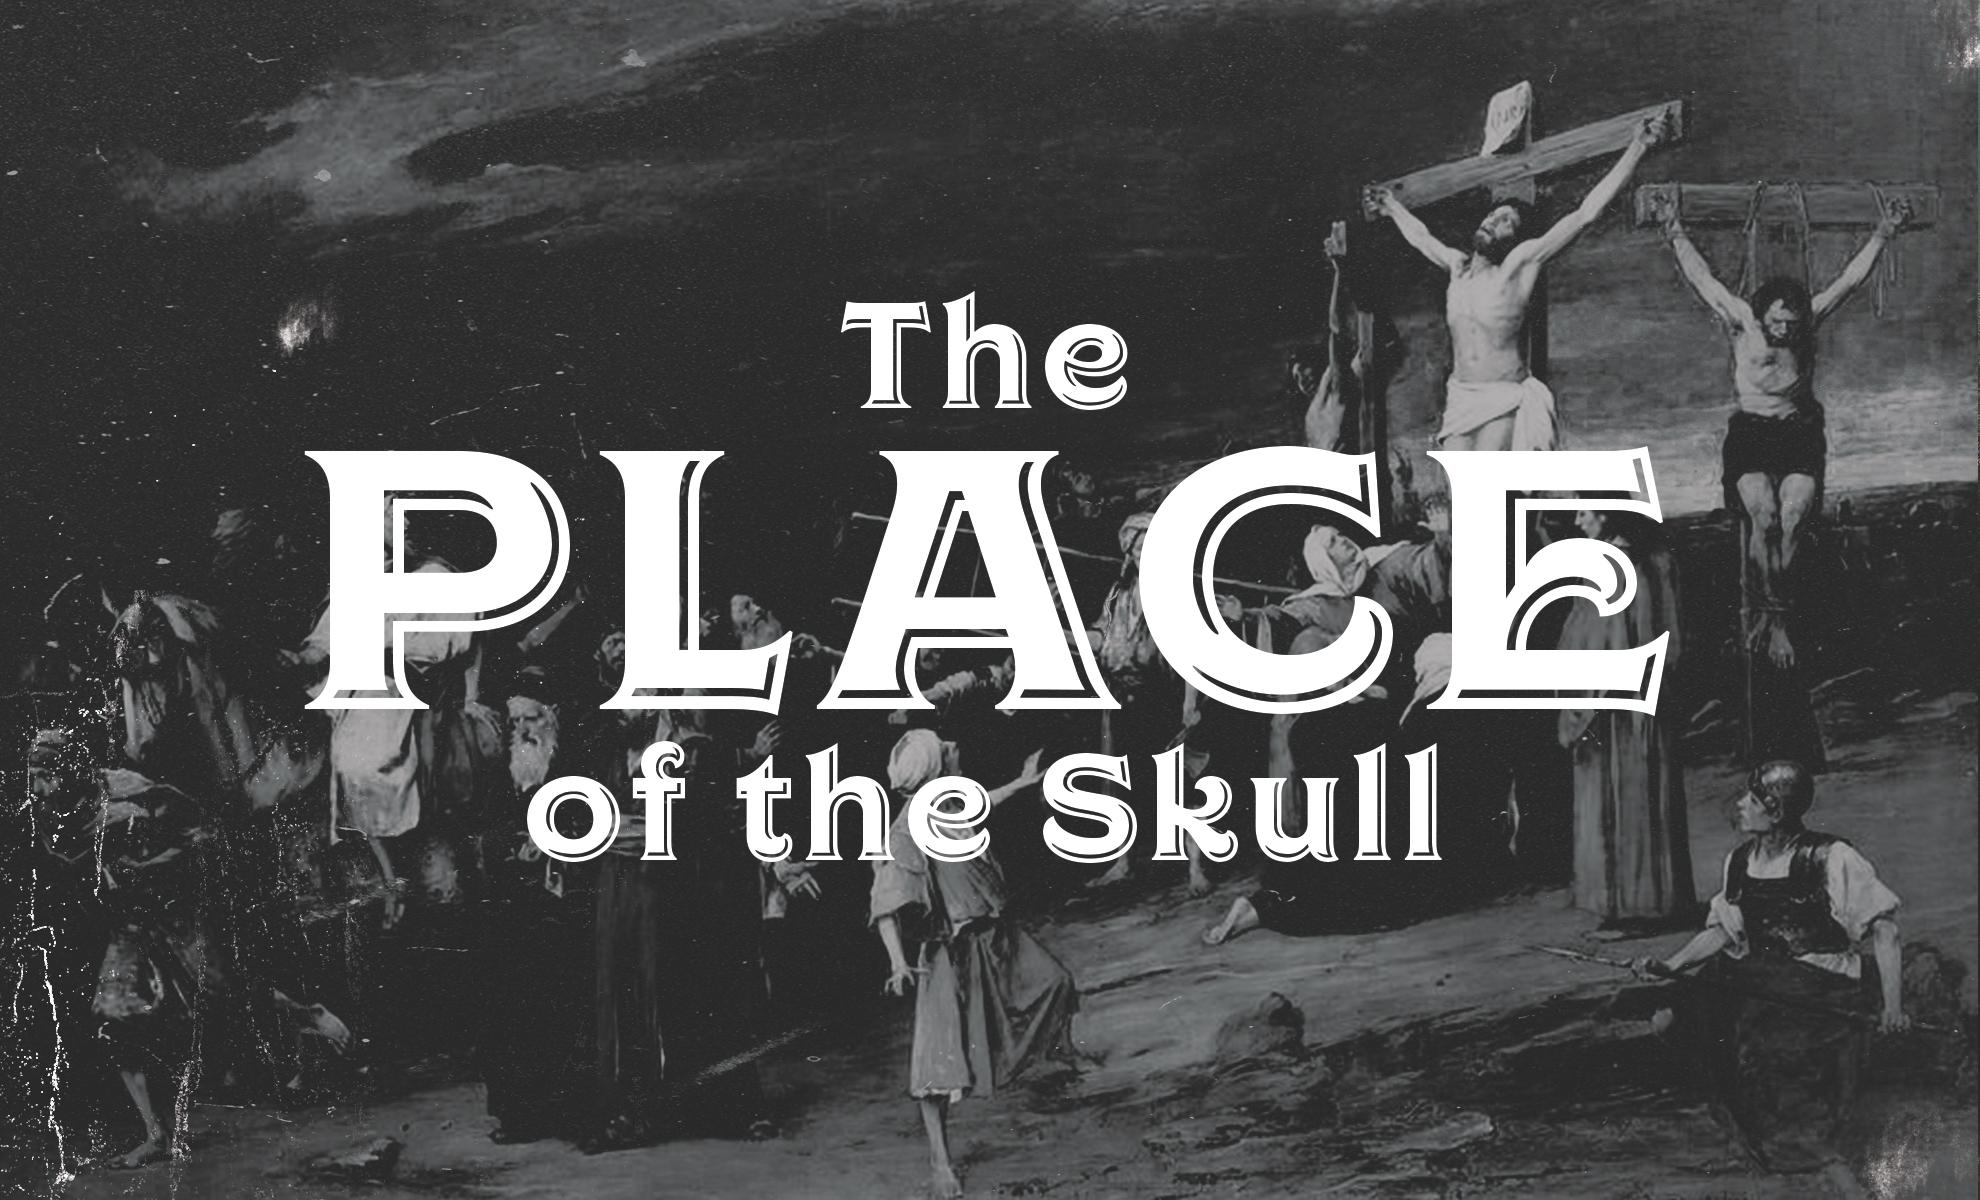 4 Good-Friday-Photo-Slides-2017 The PLace of the Skull B.jpg